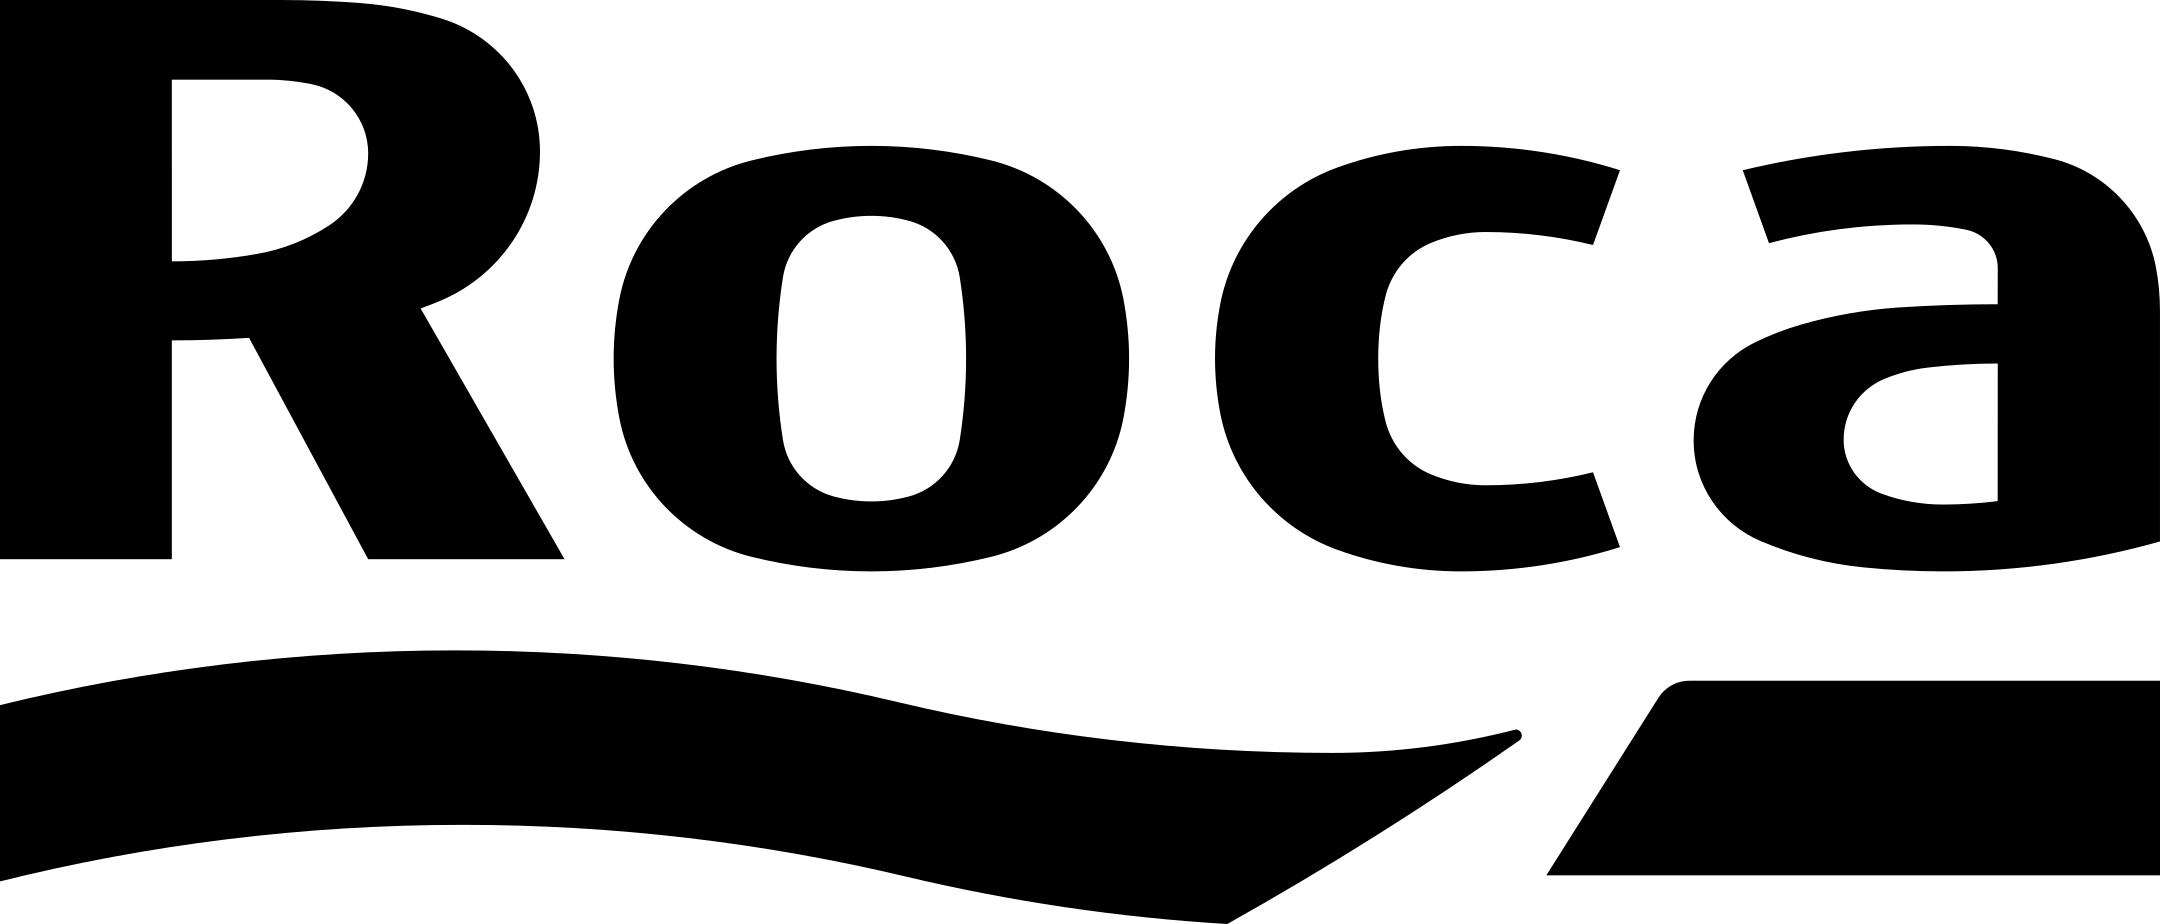 roca logo 3 - Roca Logo